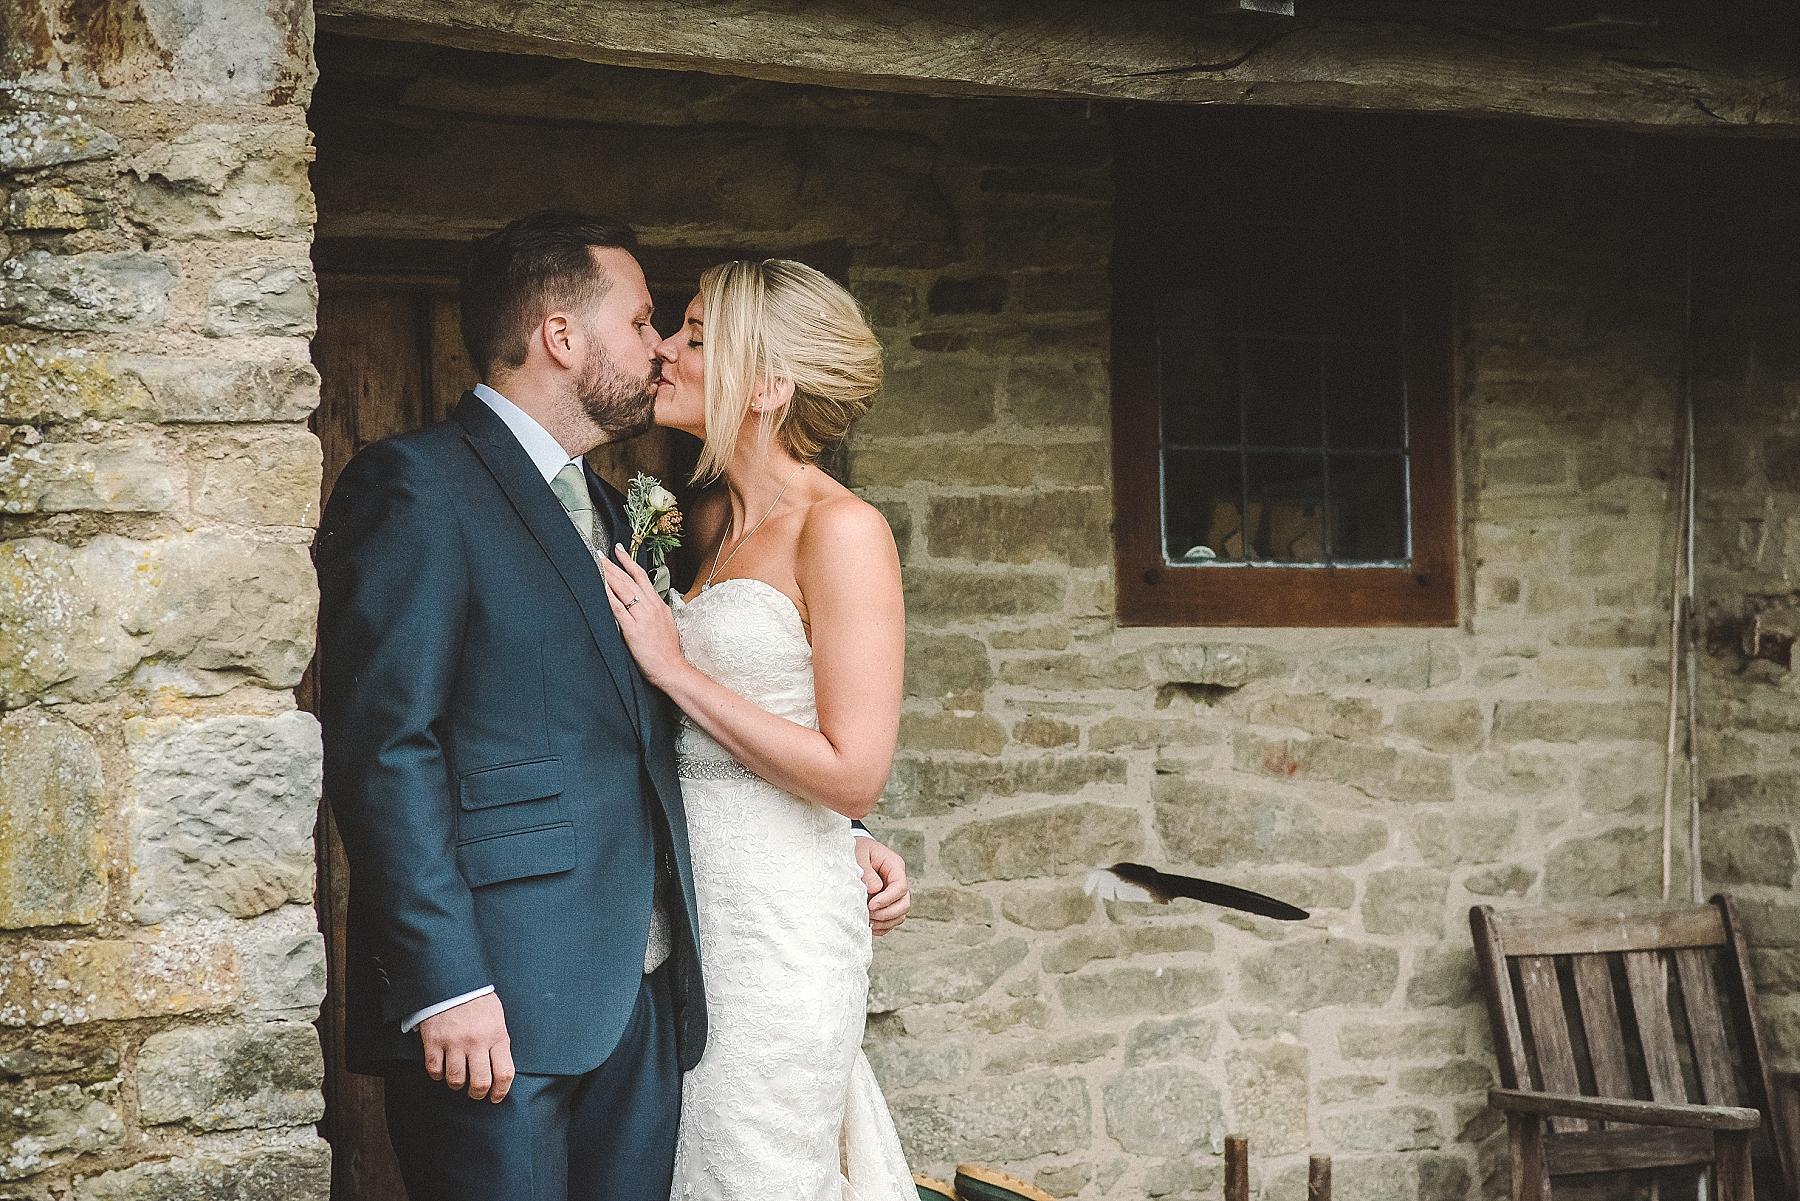 chris_keely_downton_lodge_wedding_0076.jpg